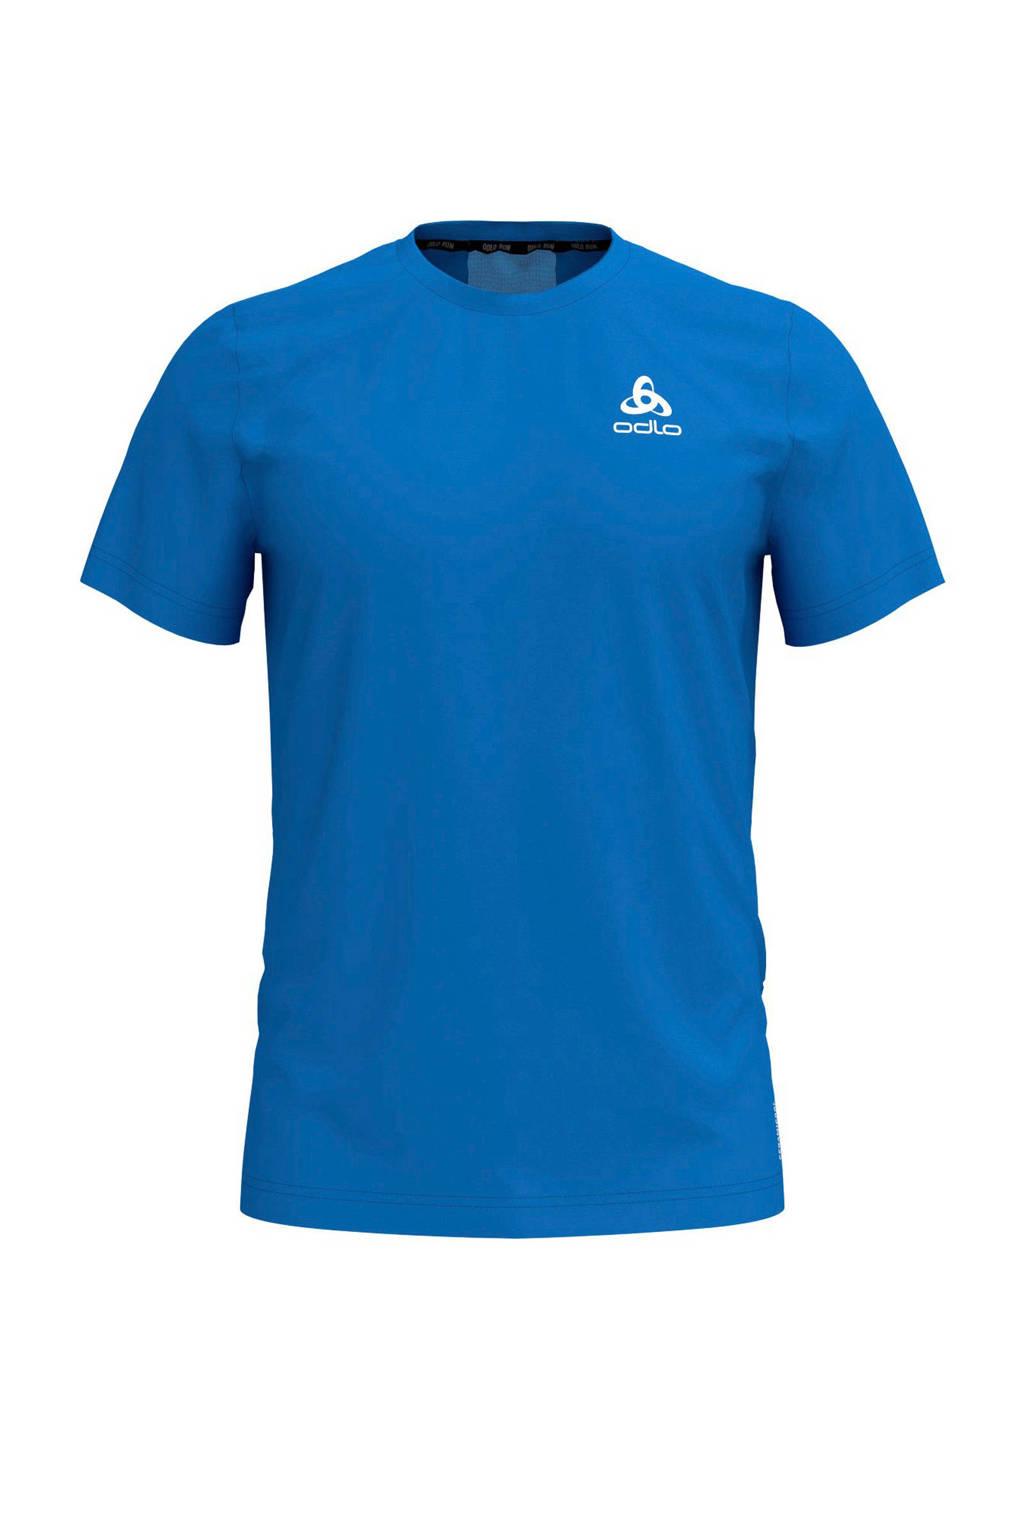 Odlo   hardloop T-shirt blauw, Blauw